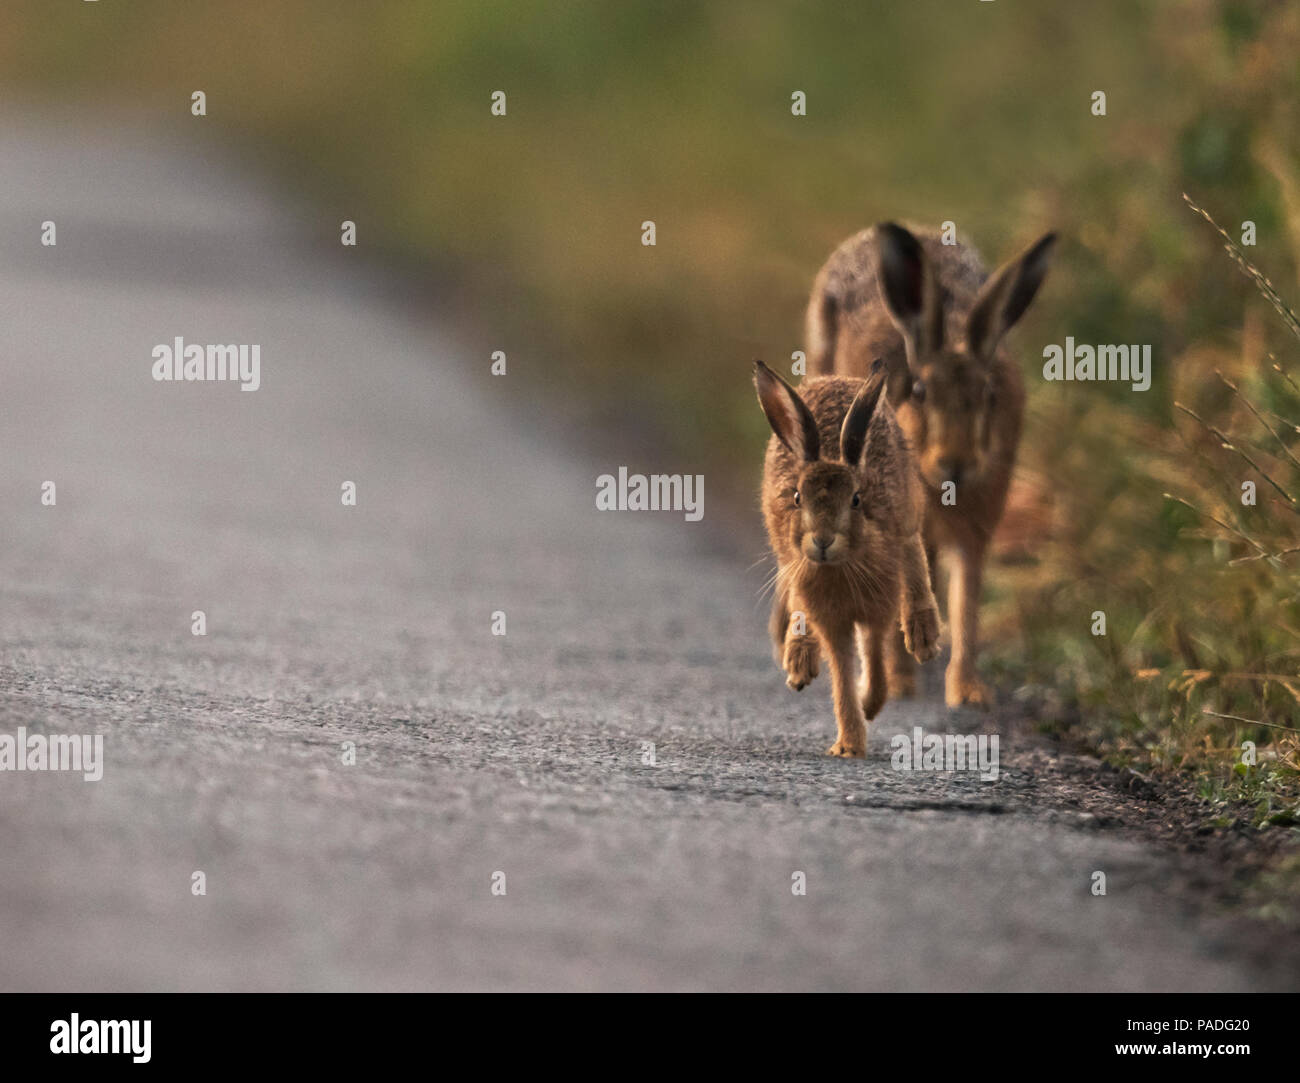 Un leveret da su madre marrón de la liebre (Lepus europaeus) rodeos en un carril del país desiertas, Gloucestershire Imagen De Stock